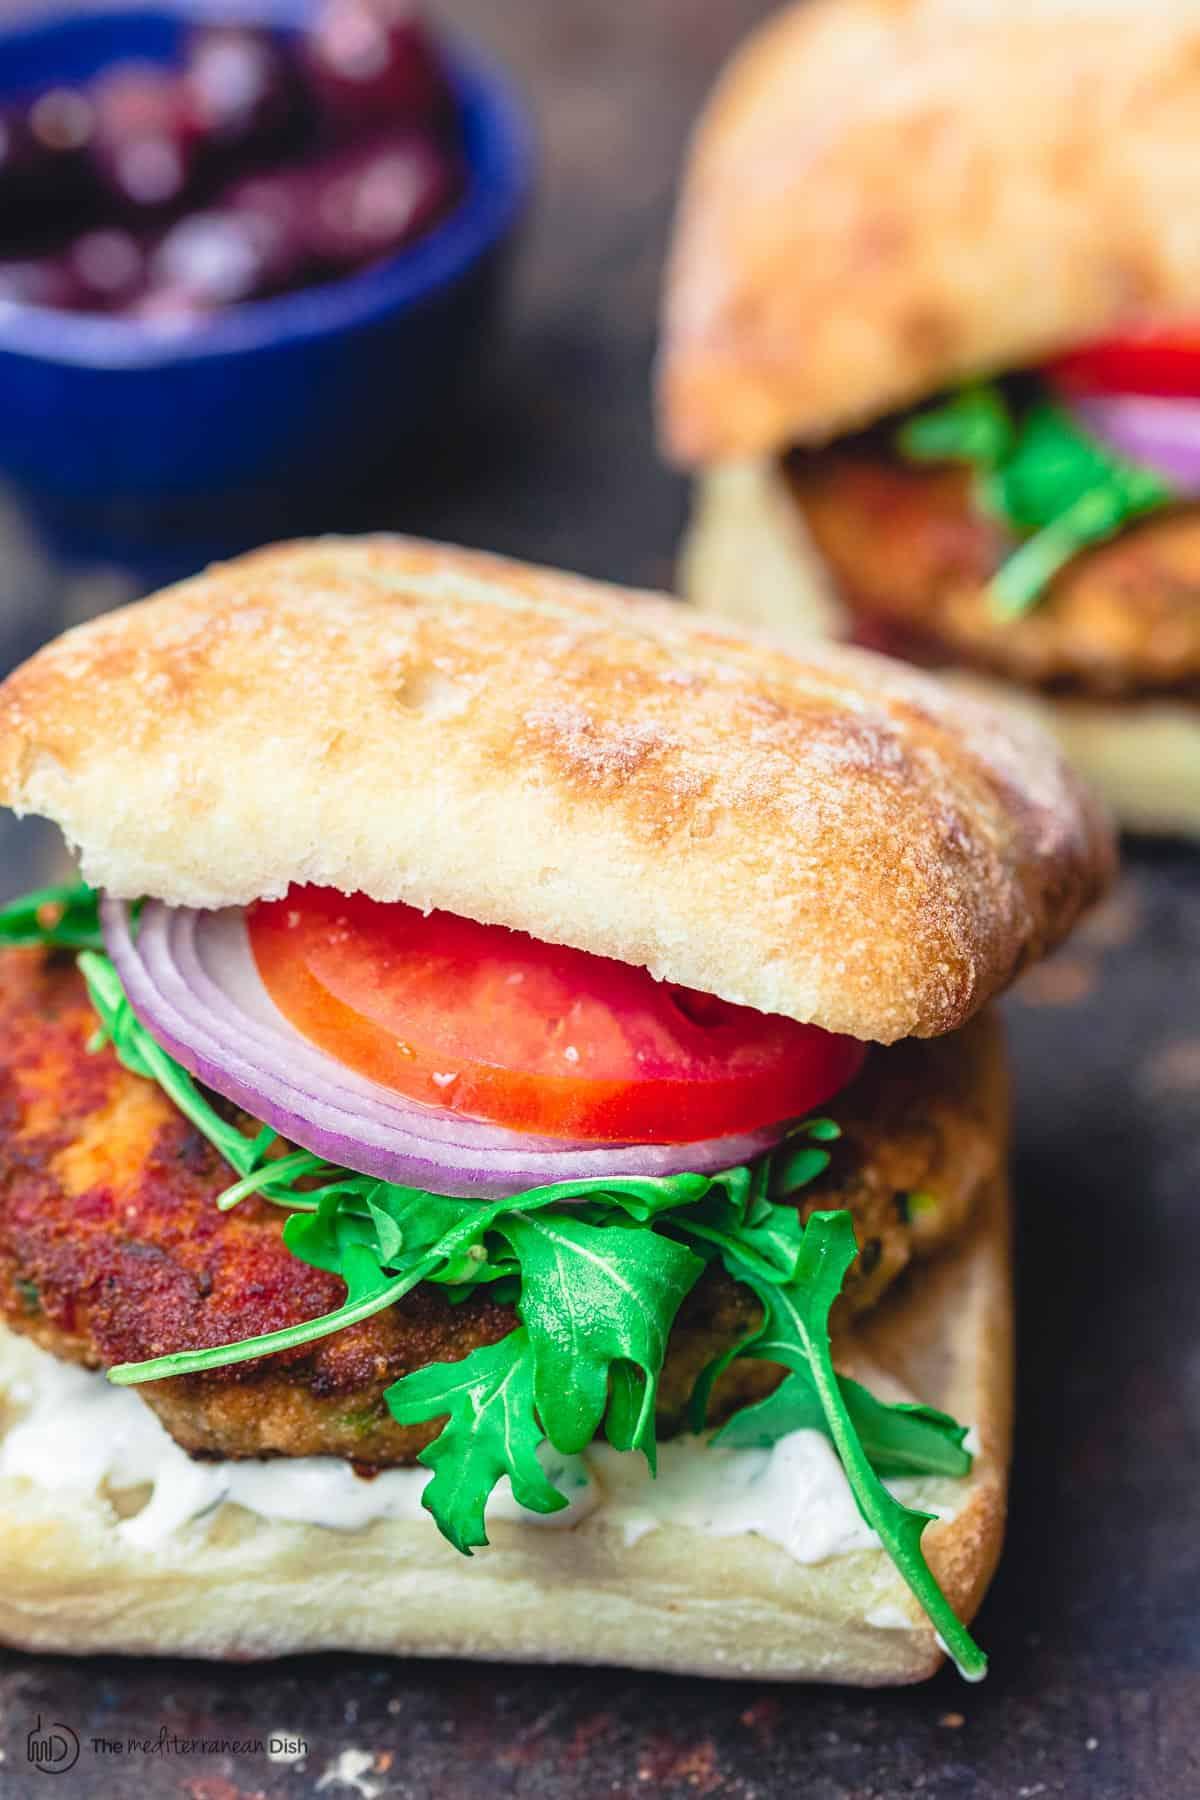 Juicy Salmon Burgers Mediterranean Style The Mediterranean Dish